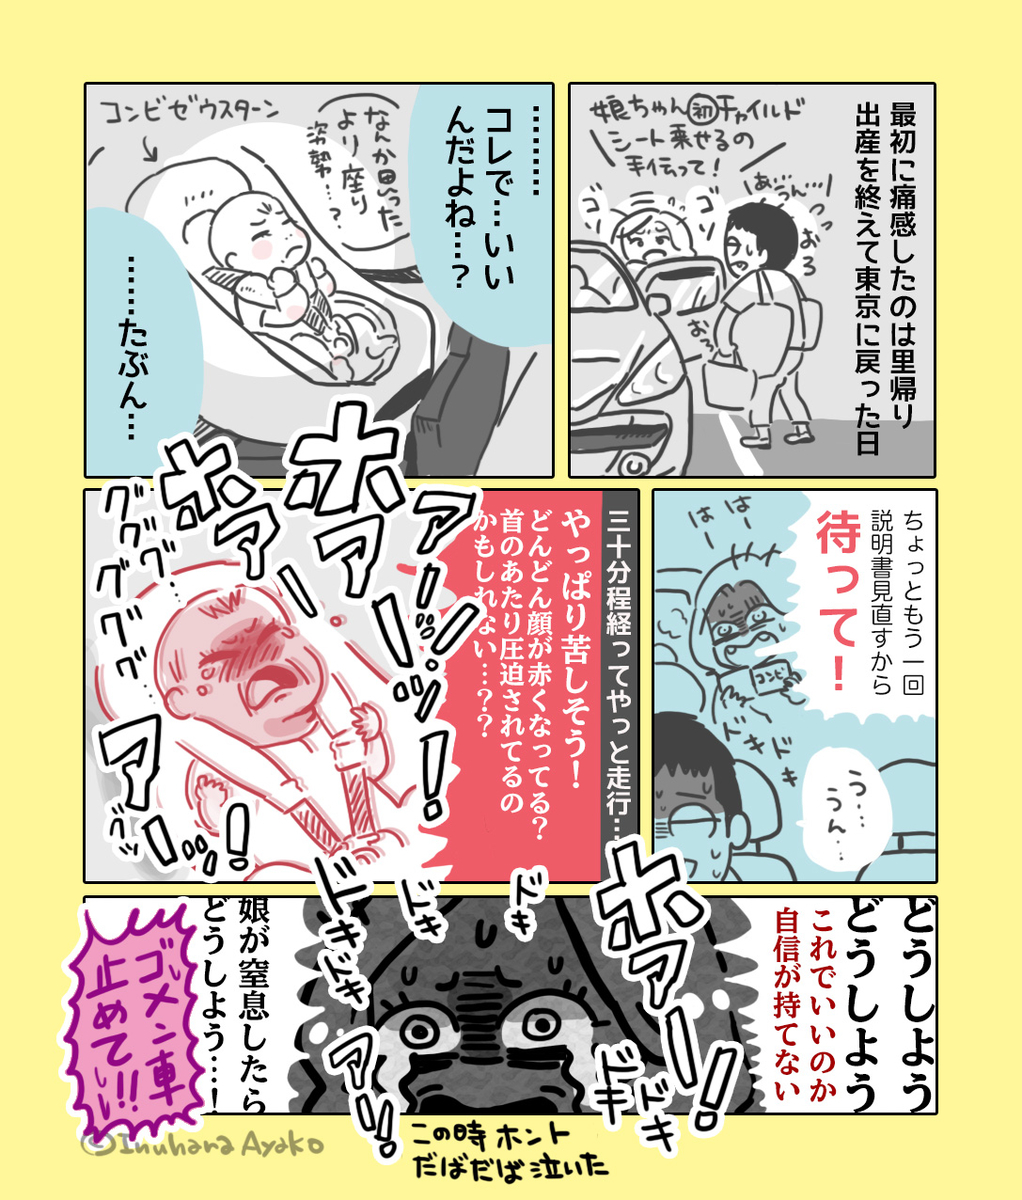 f:id:kaitousyoujyo_haha:20190708163509j:plain